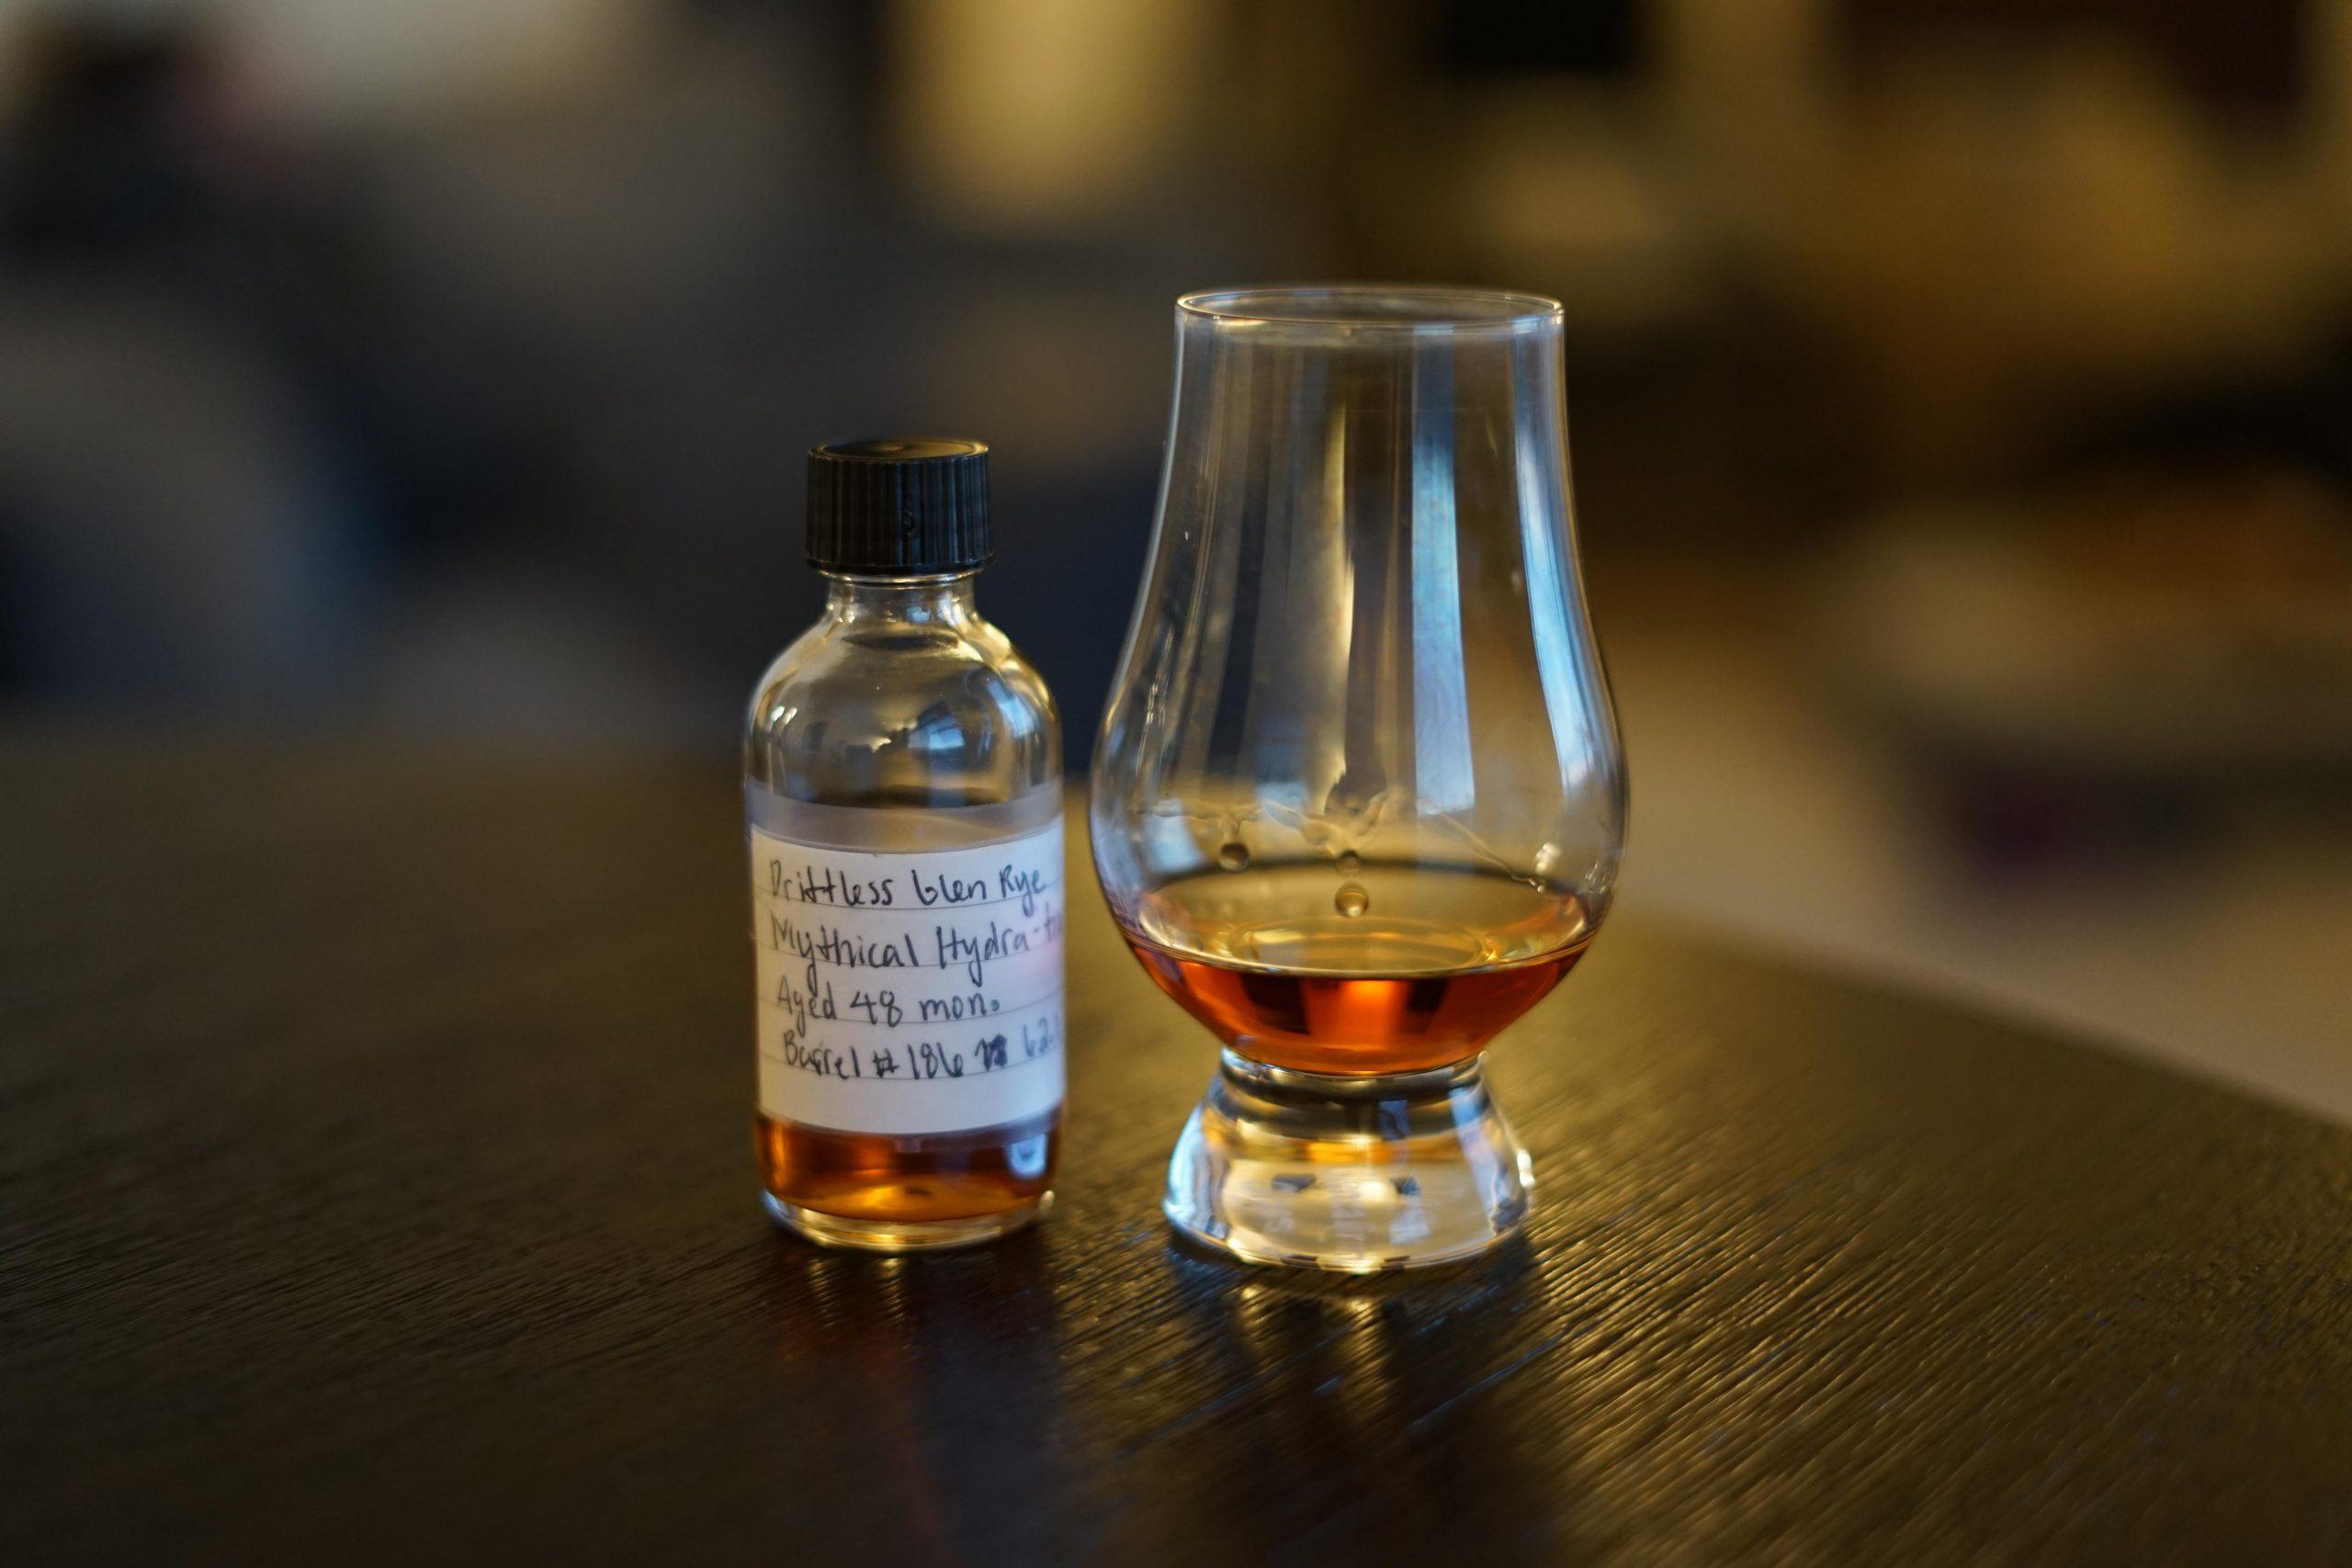 Driftless Glen Single Barrel Rye Mythical Hydration Selection